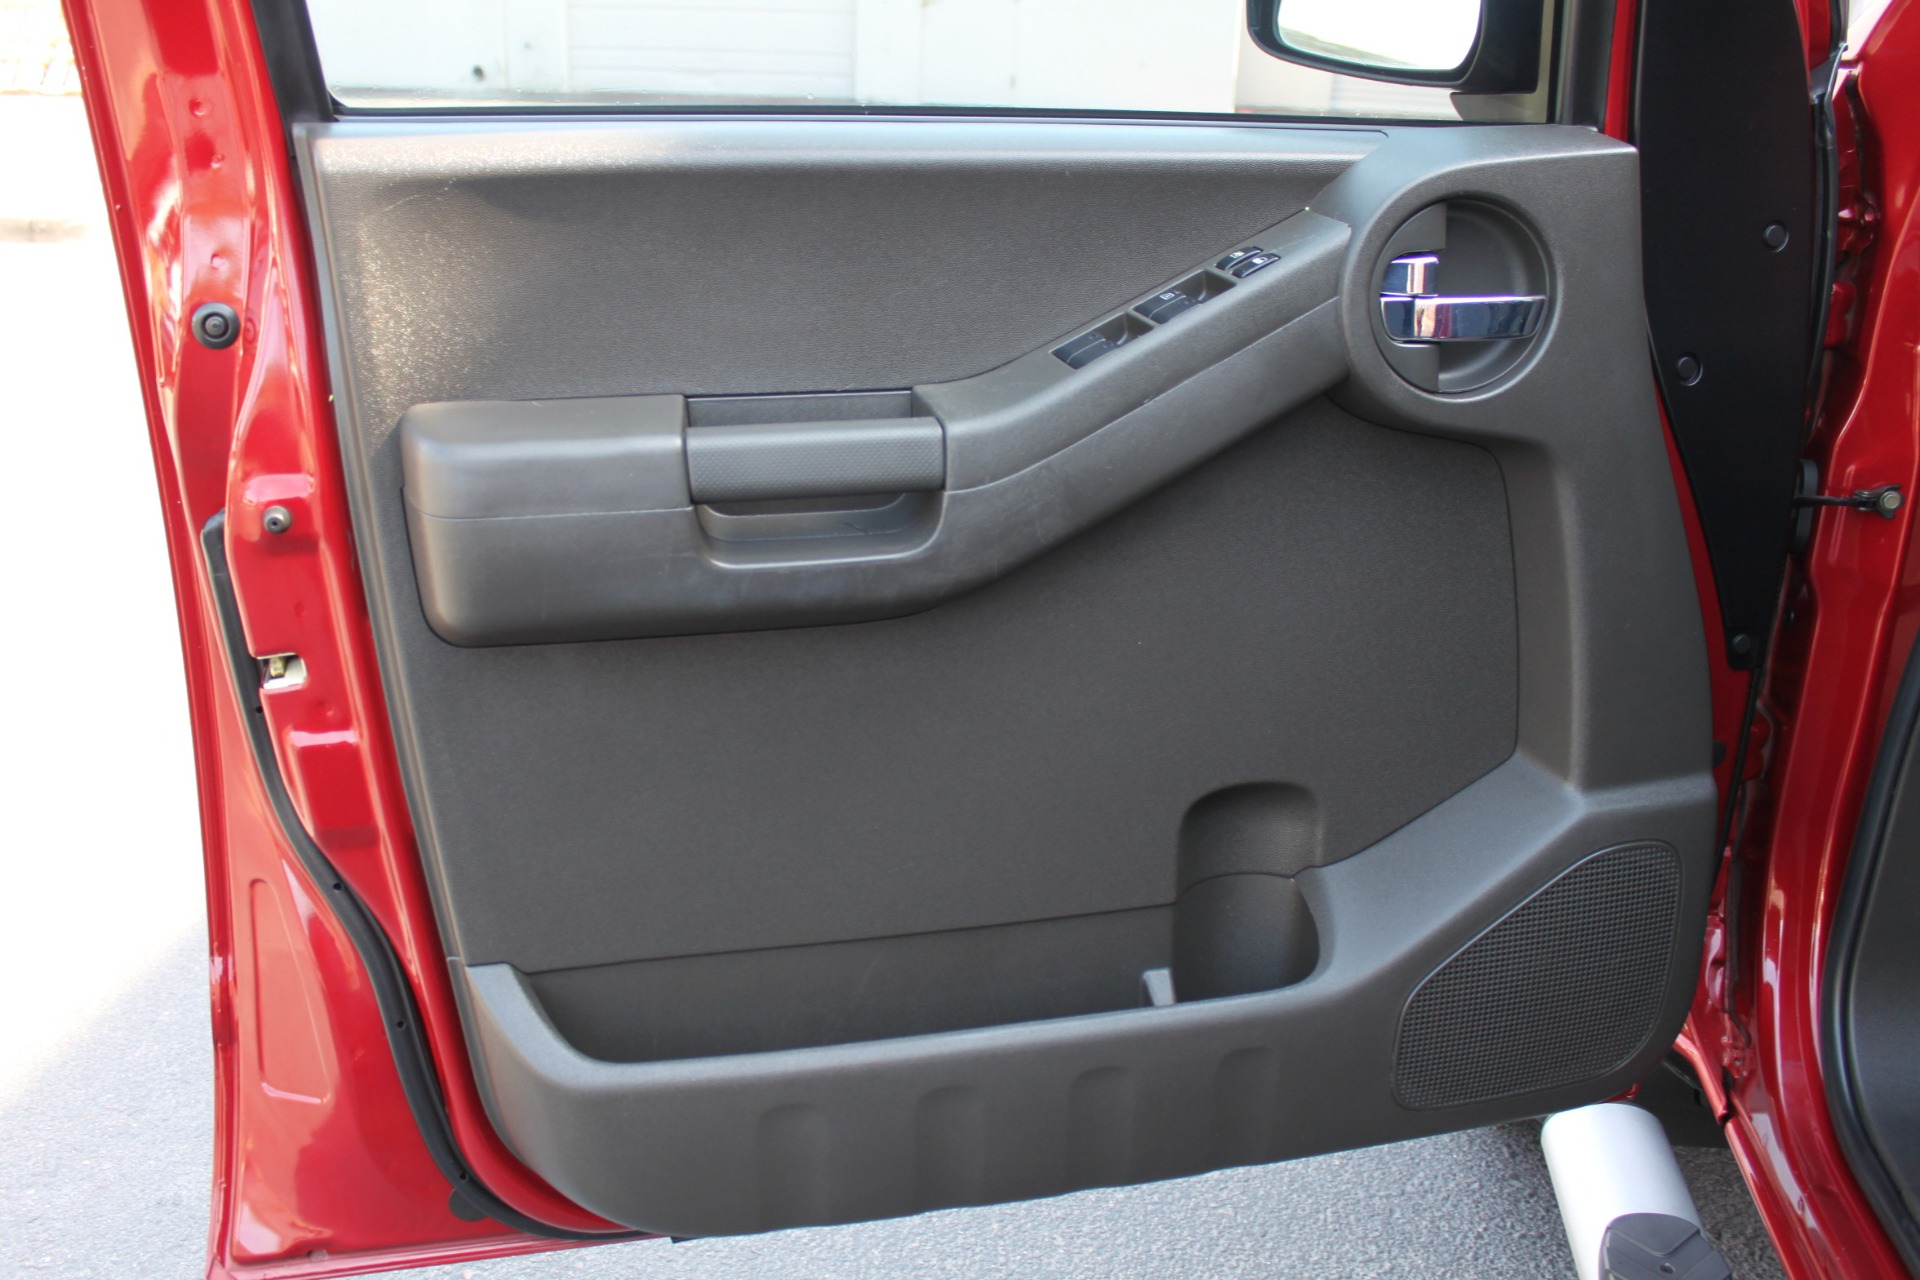 Used-2006-Nissan-Xterra-Off-Road-Jaguar